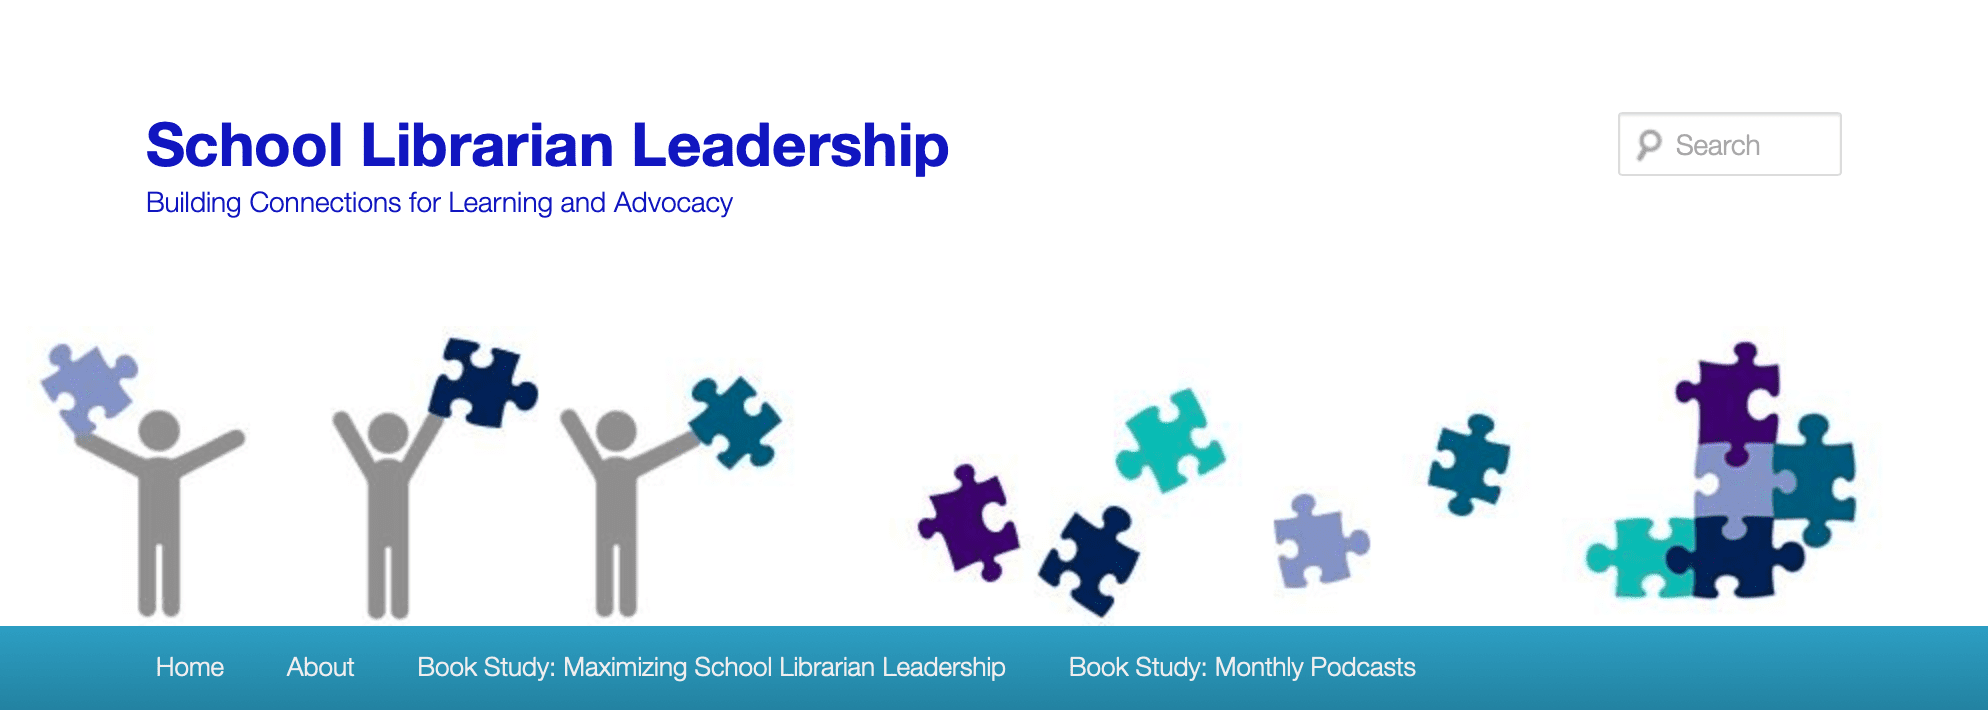 Blog | School Librarian Leadership Newsroom